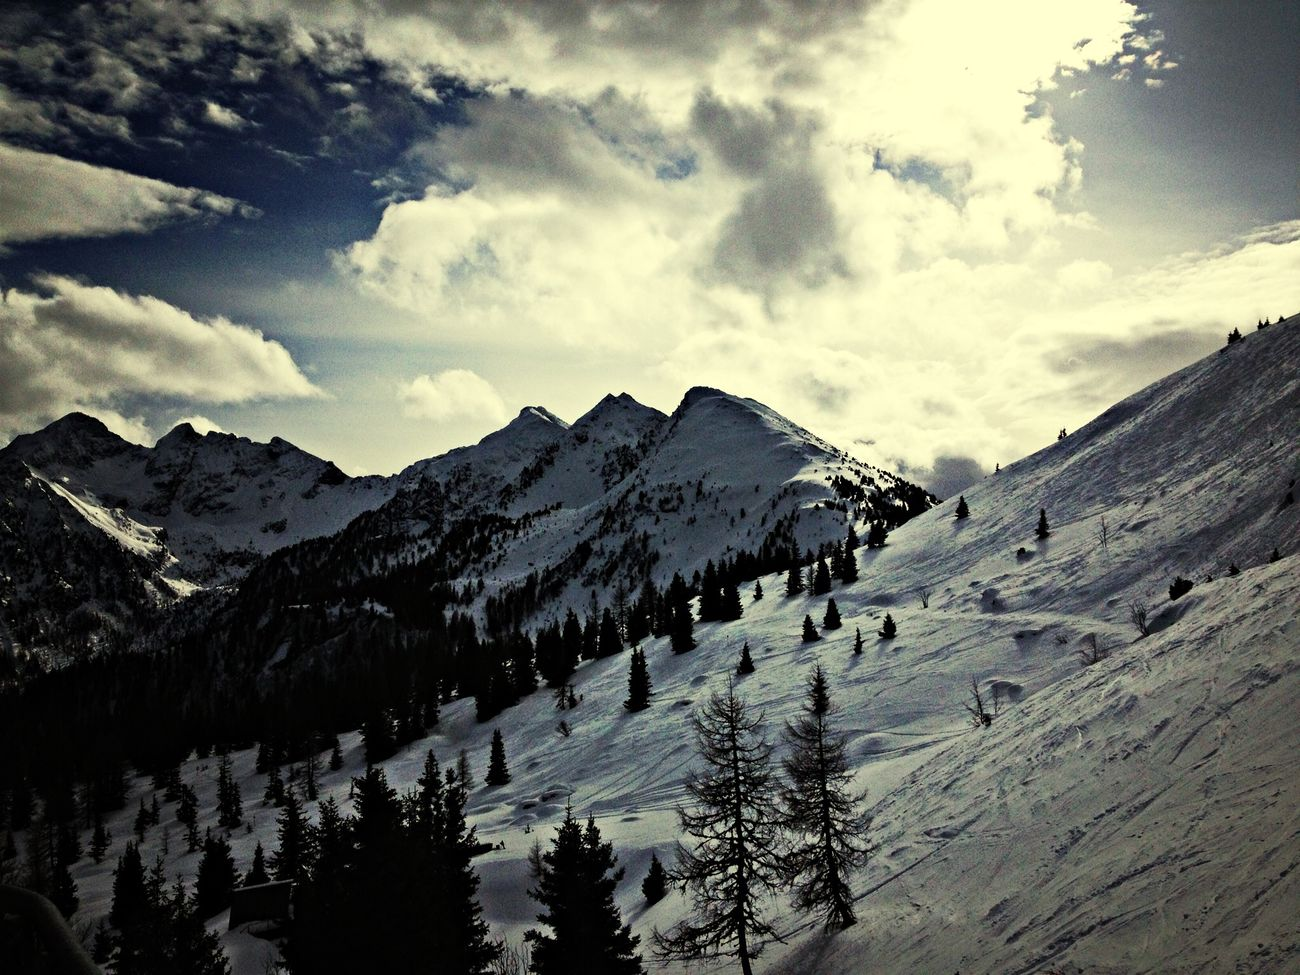 Memories from Austria